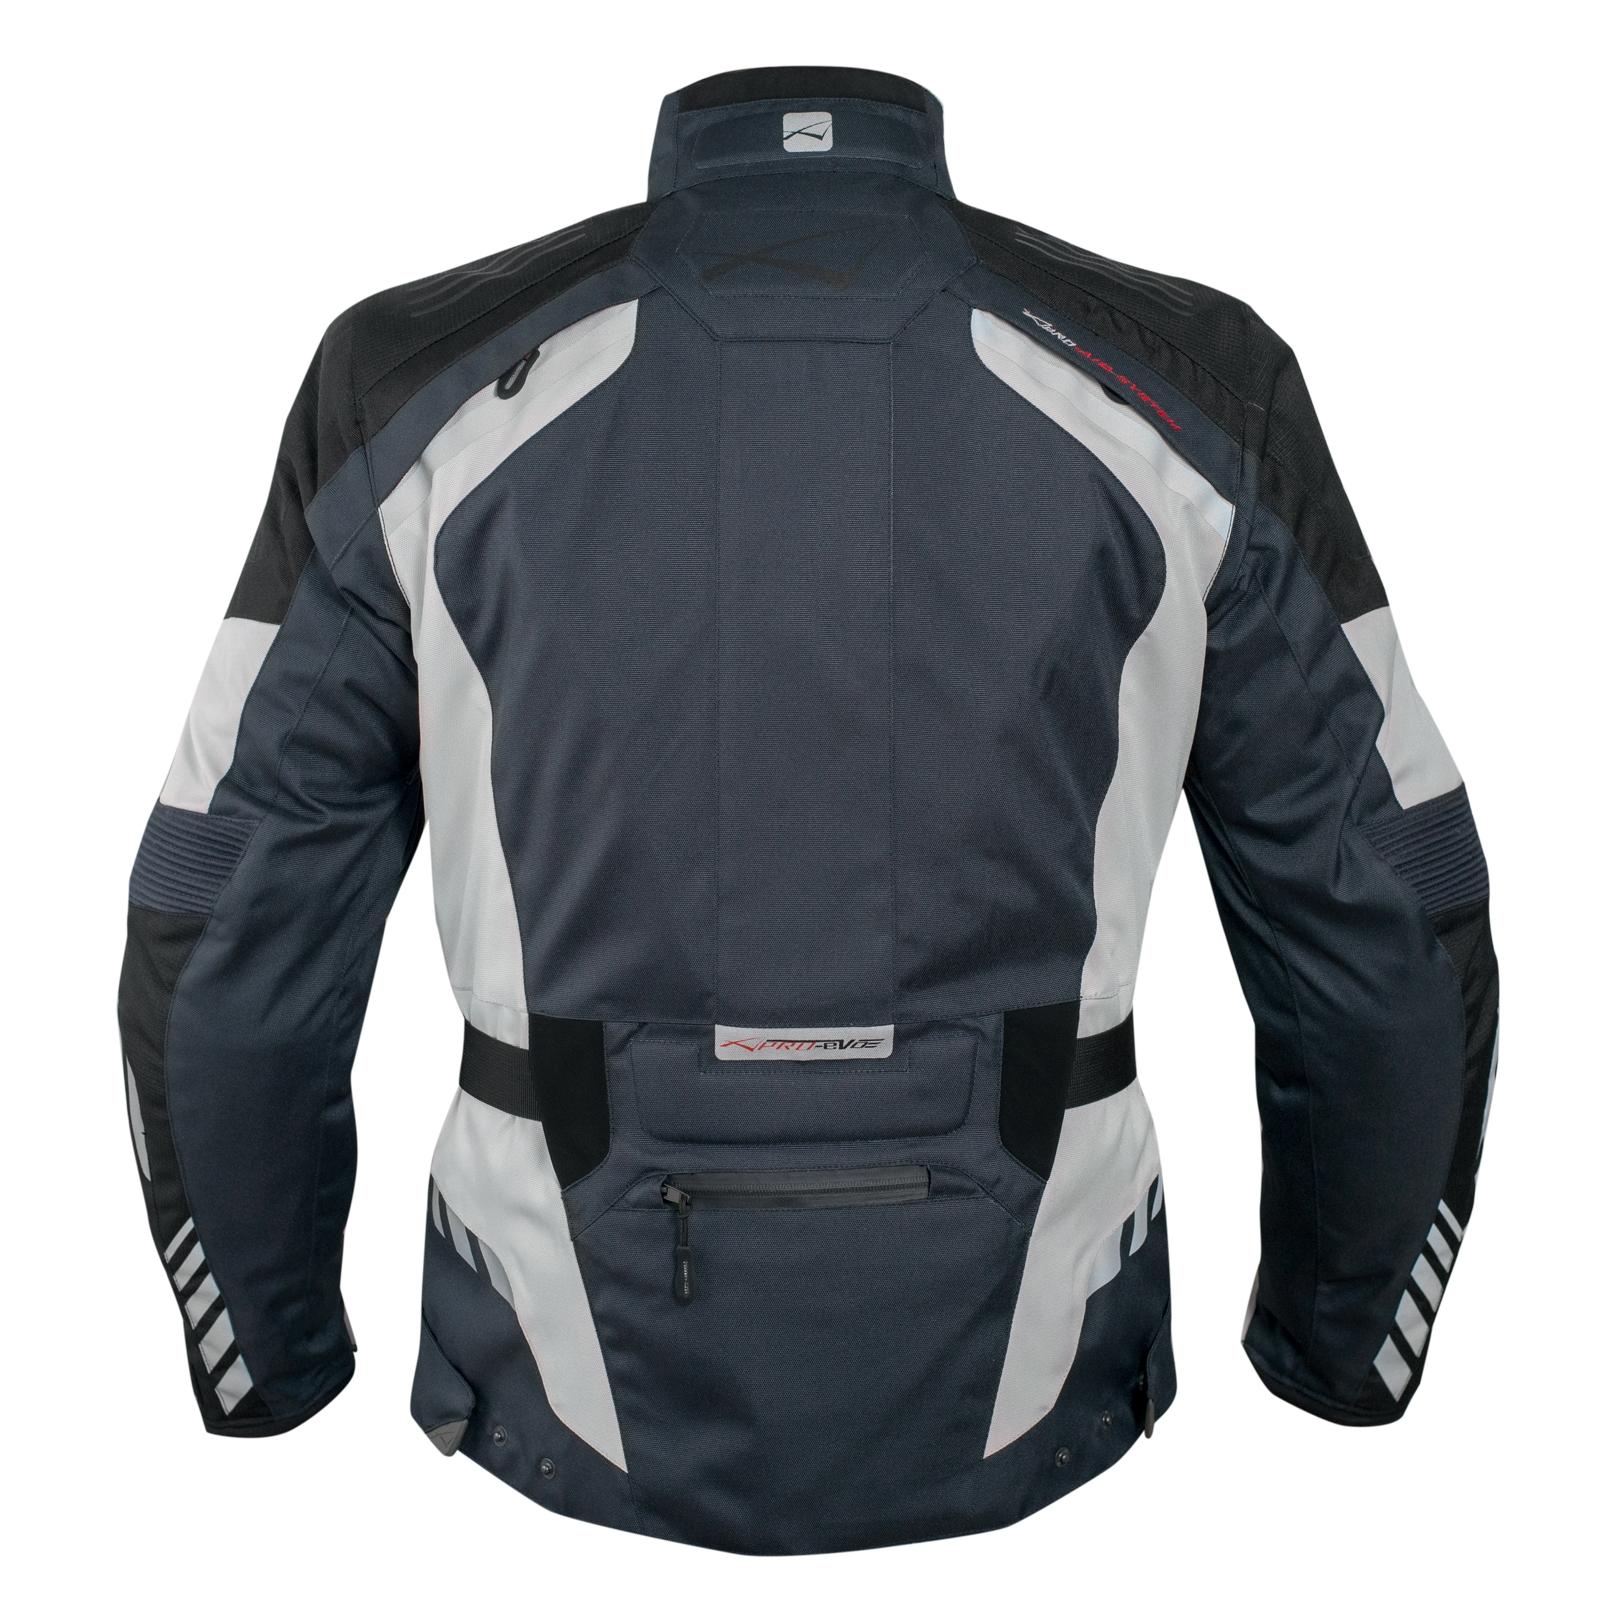 Blouson-Moto-Tissu-Veste-Impermeable-Doublure-Hivernale-Reflechissant-Respirant miniature 11